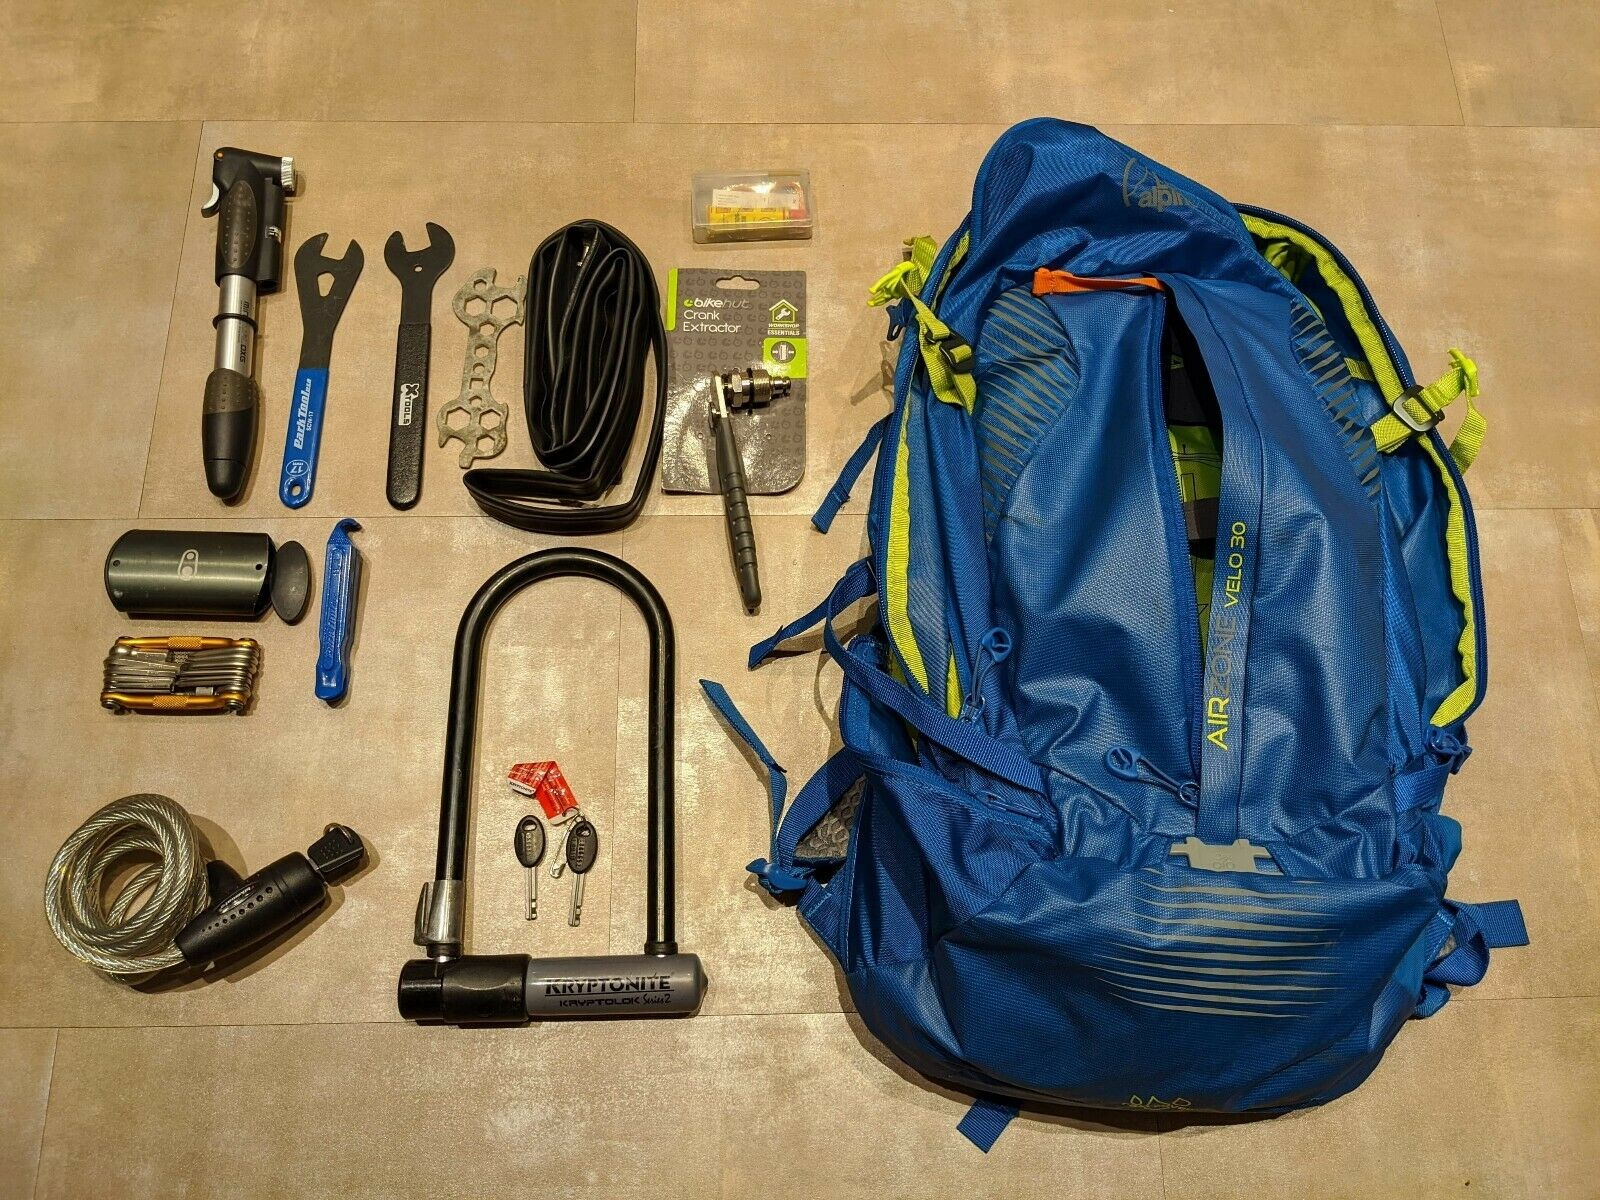 Laage Alpine Airzone Rugzak met Bike Kit BEPERKT EDITION